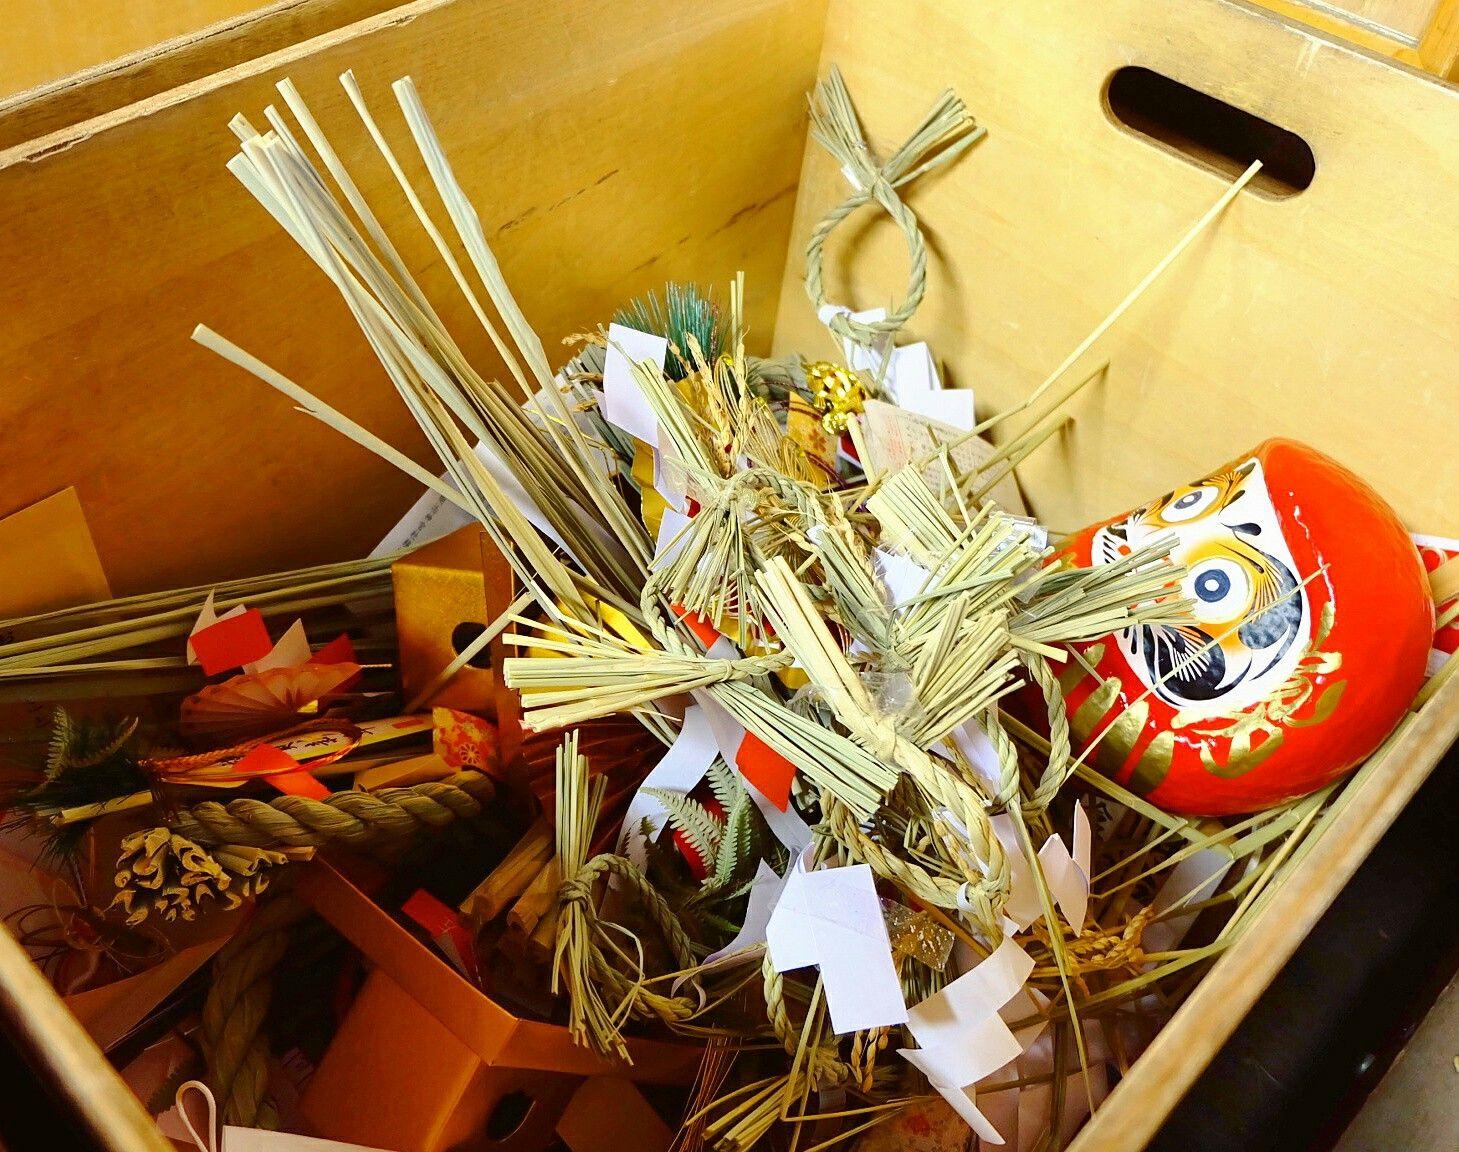 Offerings, Meiji Jingu Shrine, Tokyo Travel photos